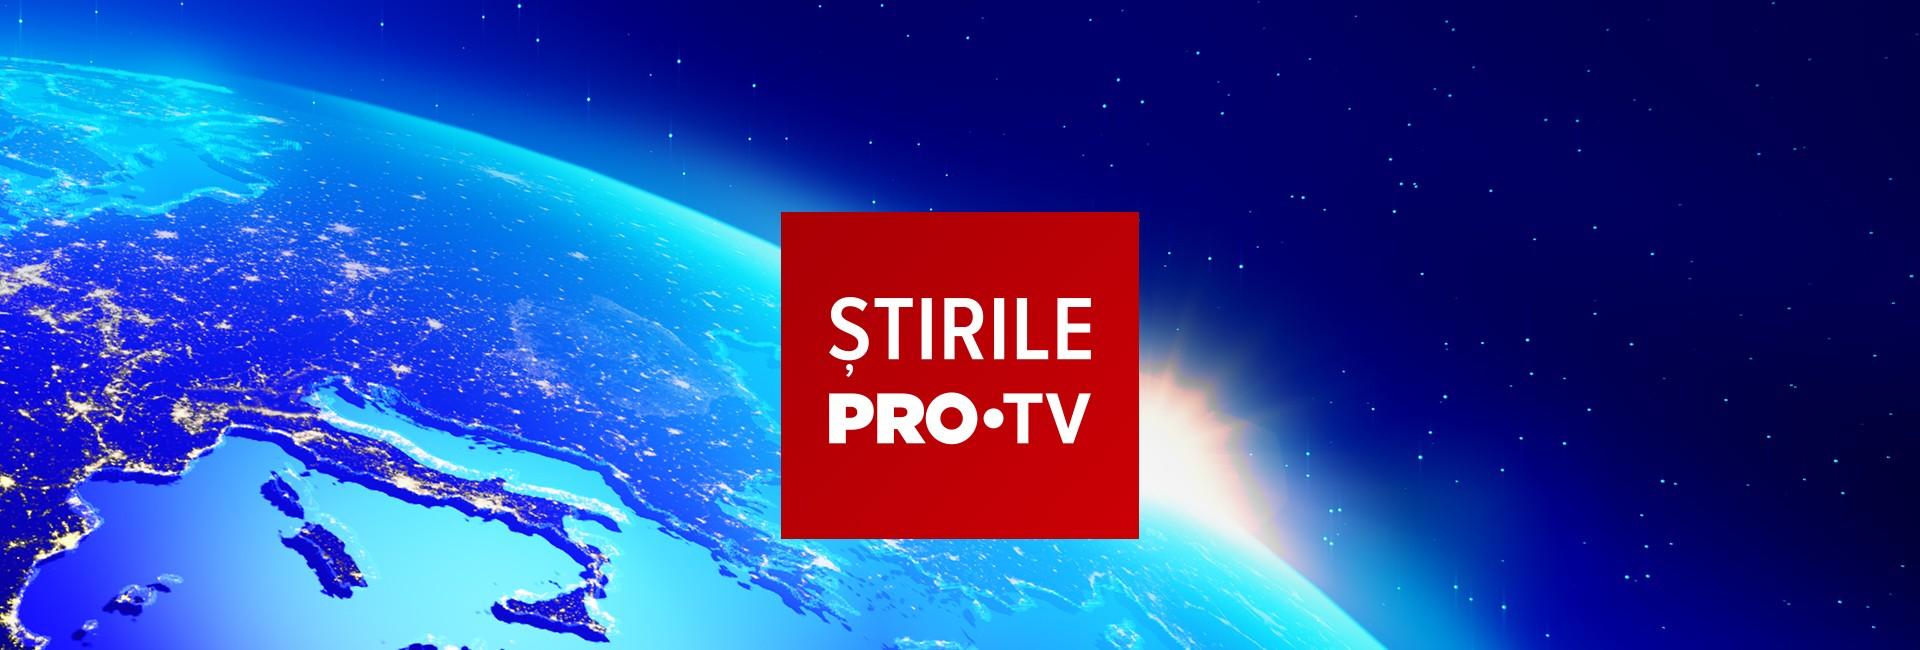 Stirile PRO TV